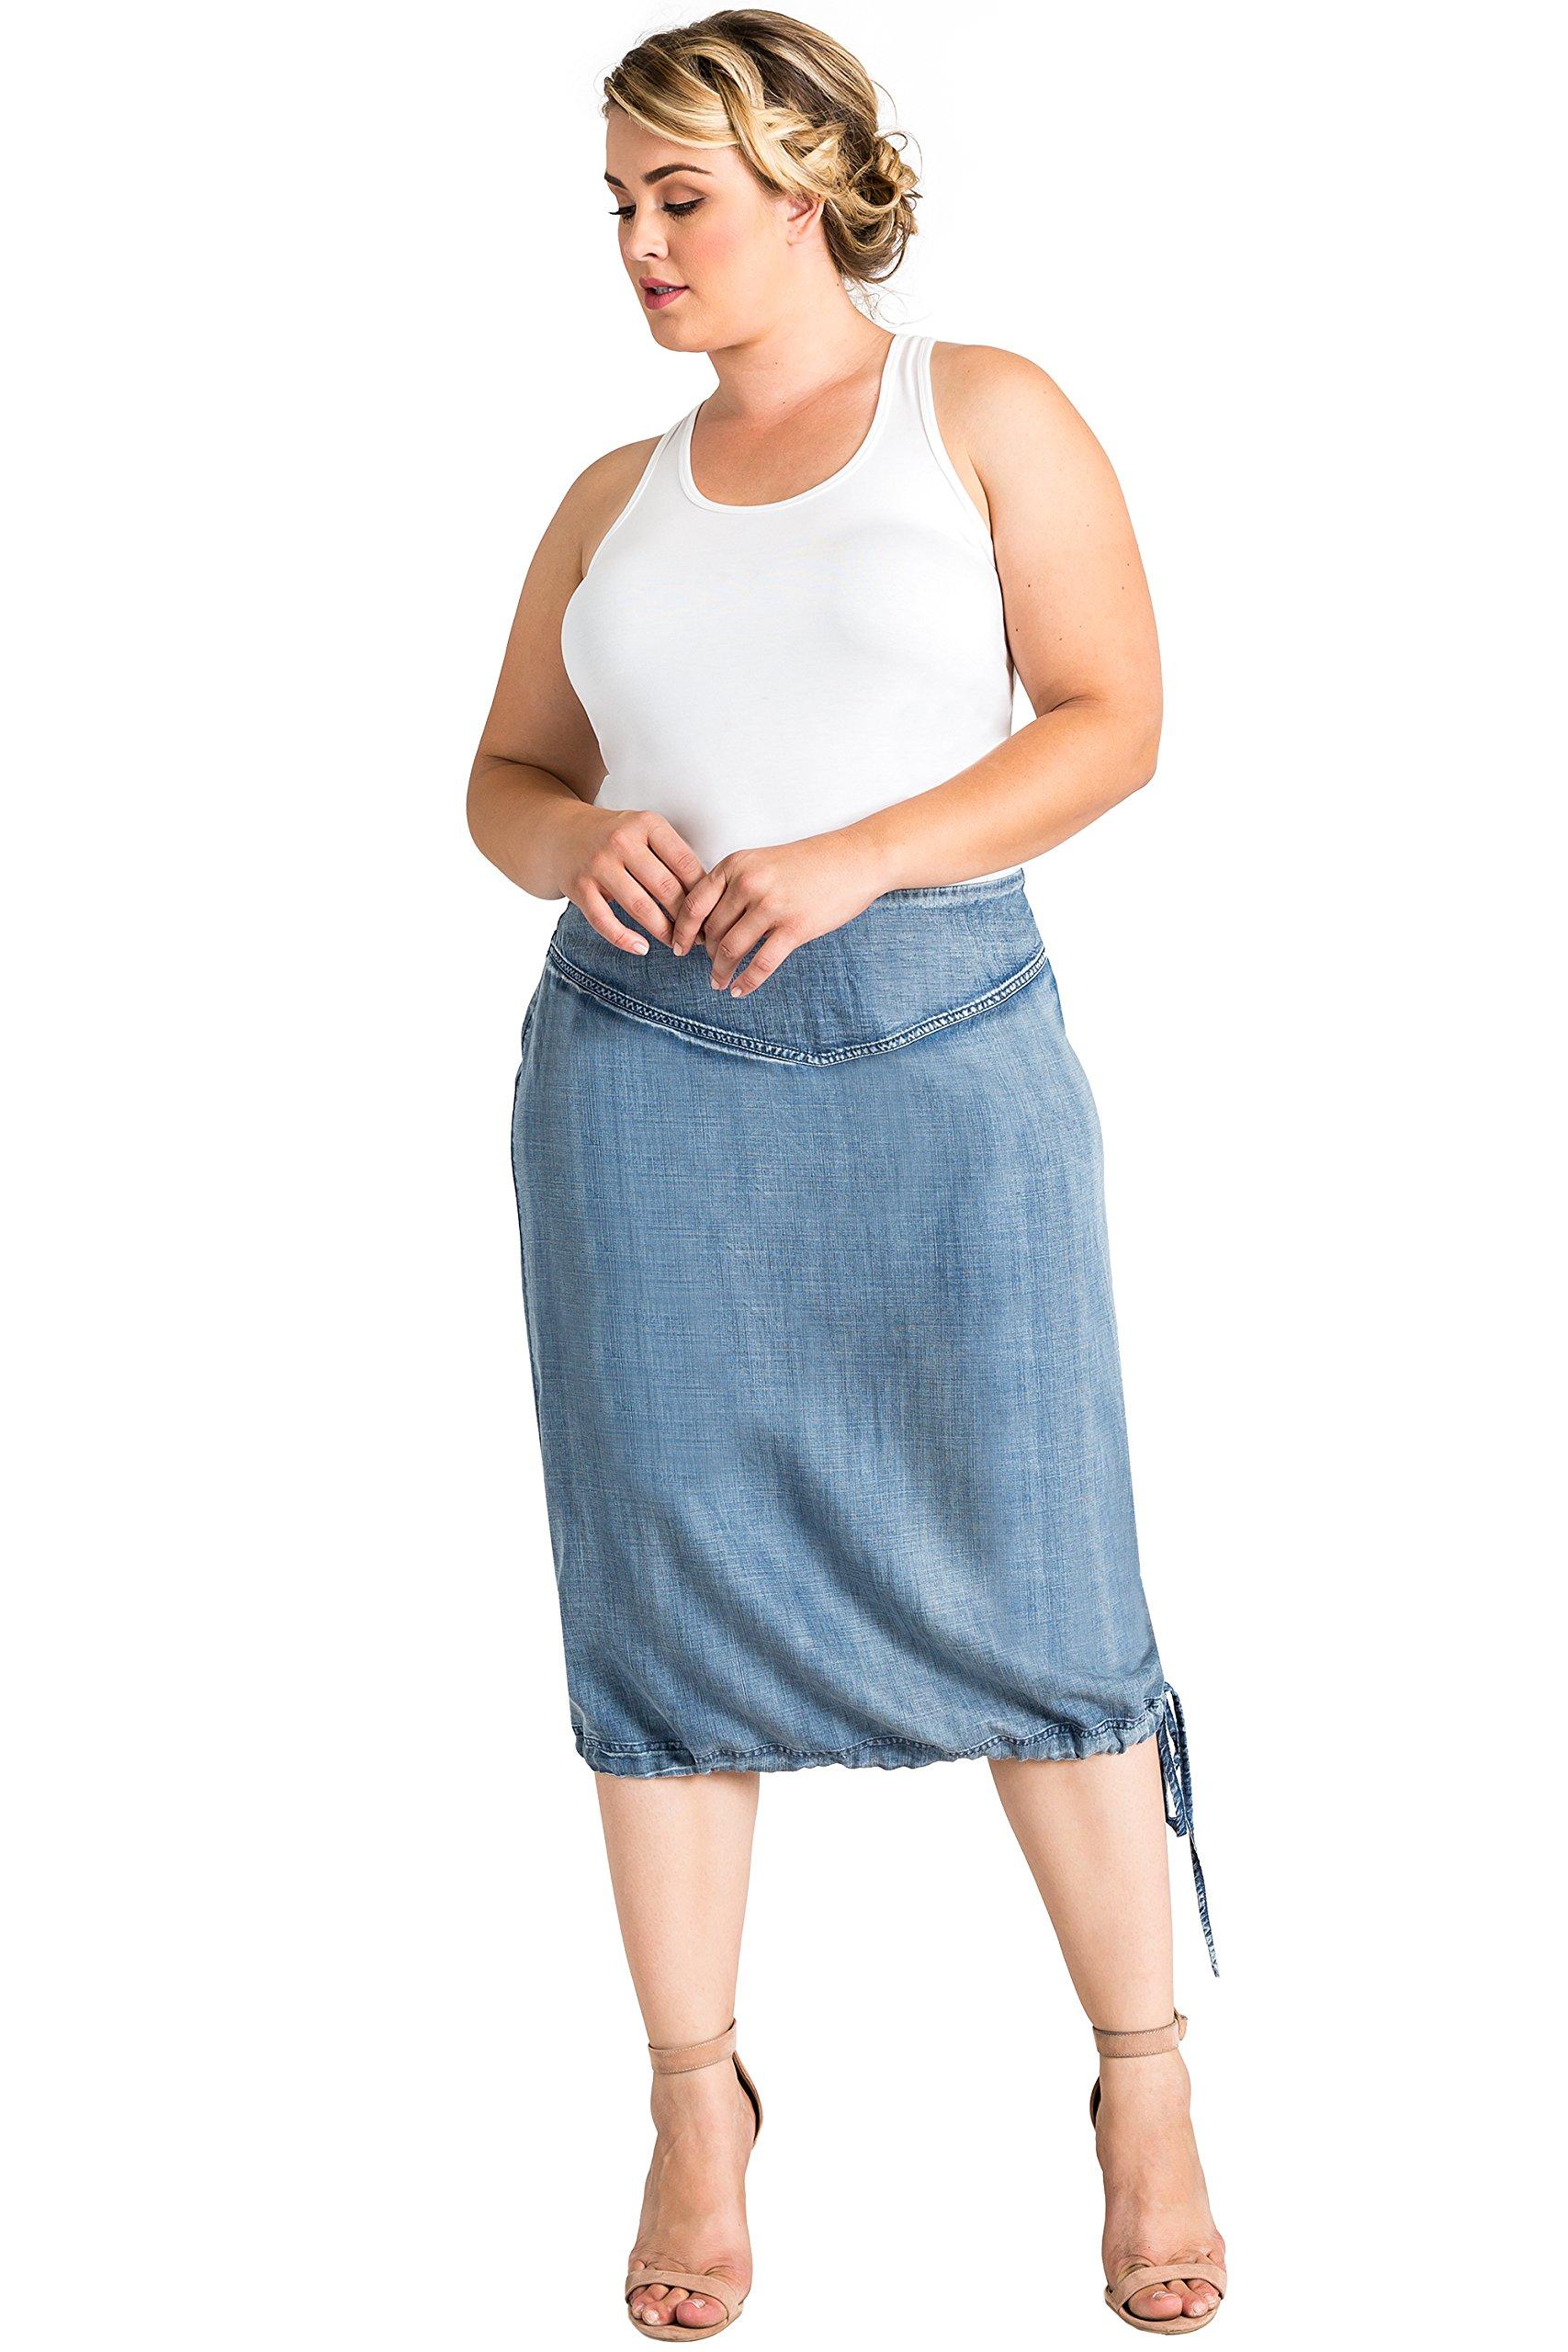 Standards & Practices Curvy Women's Plus Size Light Tencel Denim Adjustable Hem Skirt Size 1X by Standards & Practices